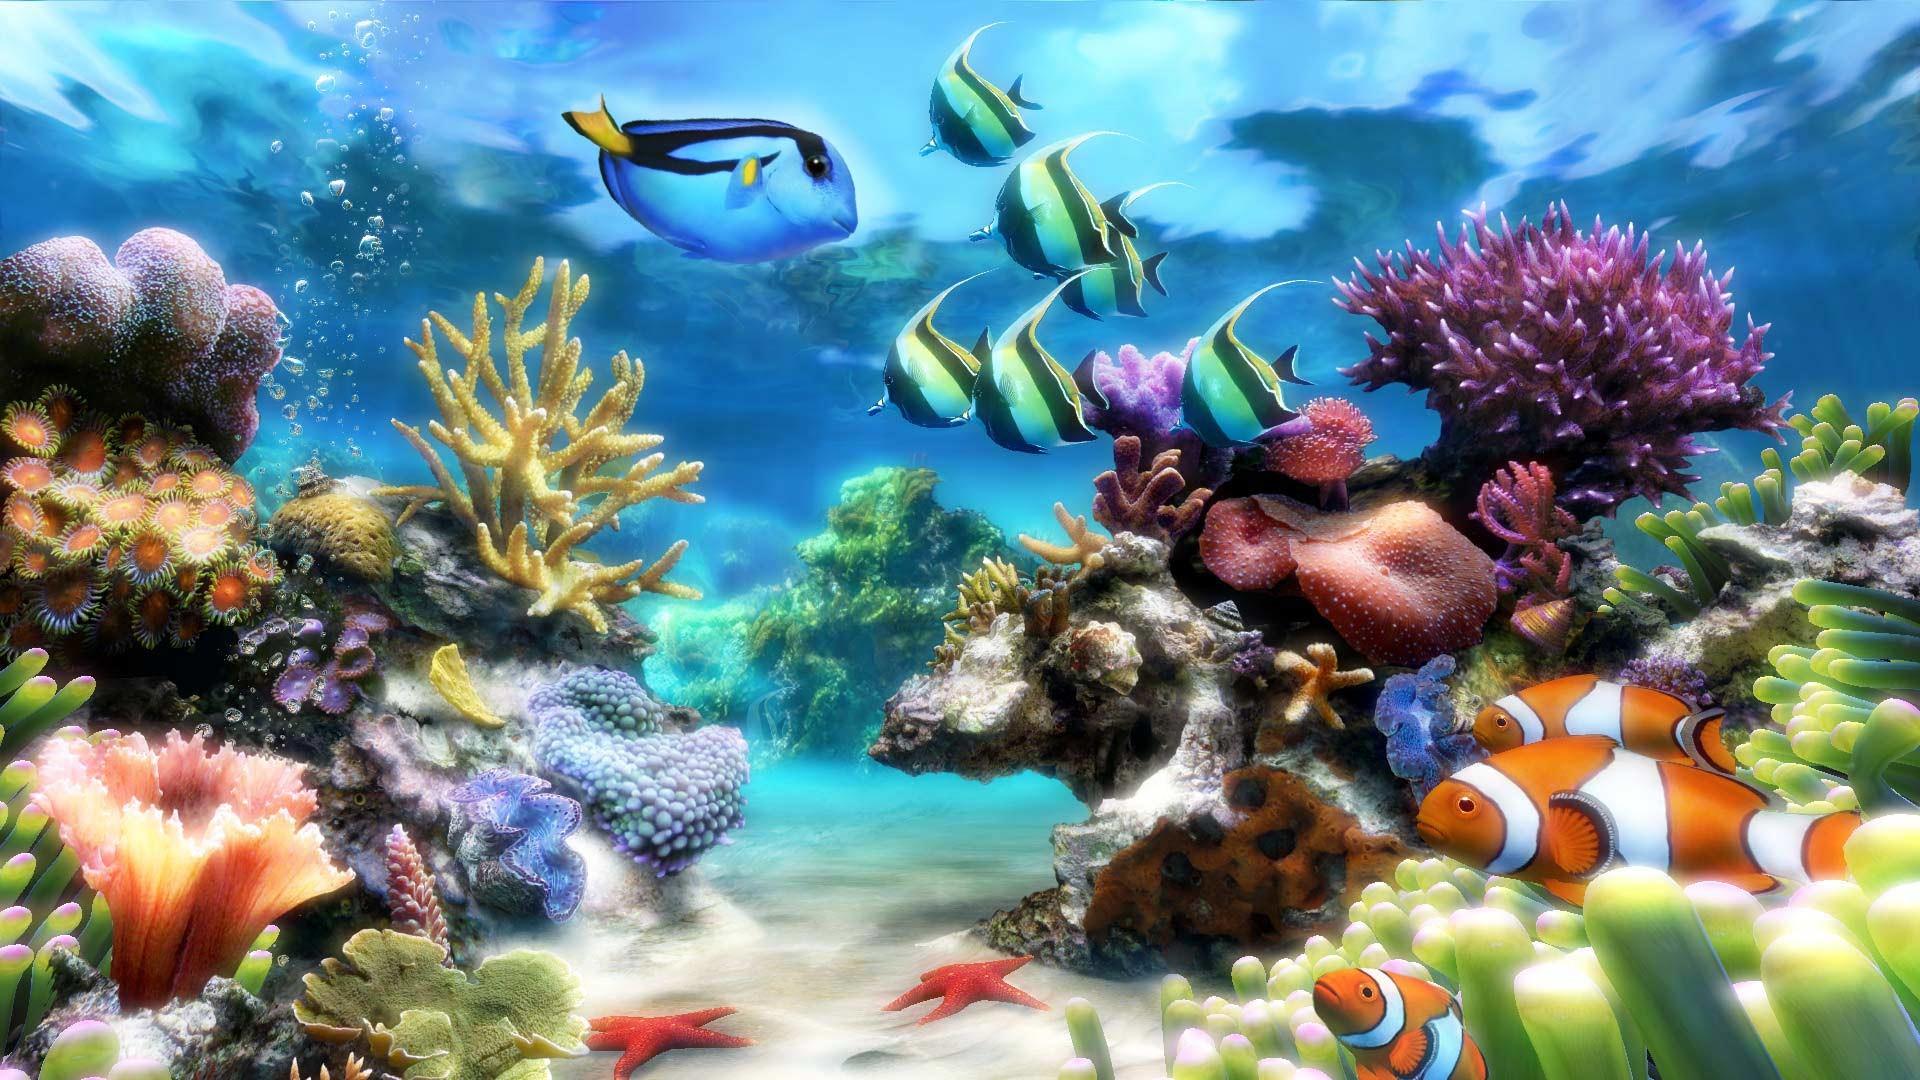 3d fish tank wallpaper 59 images - Fish tank screensaver pc free ...